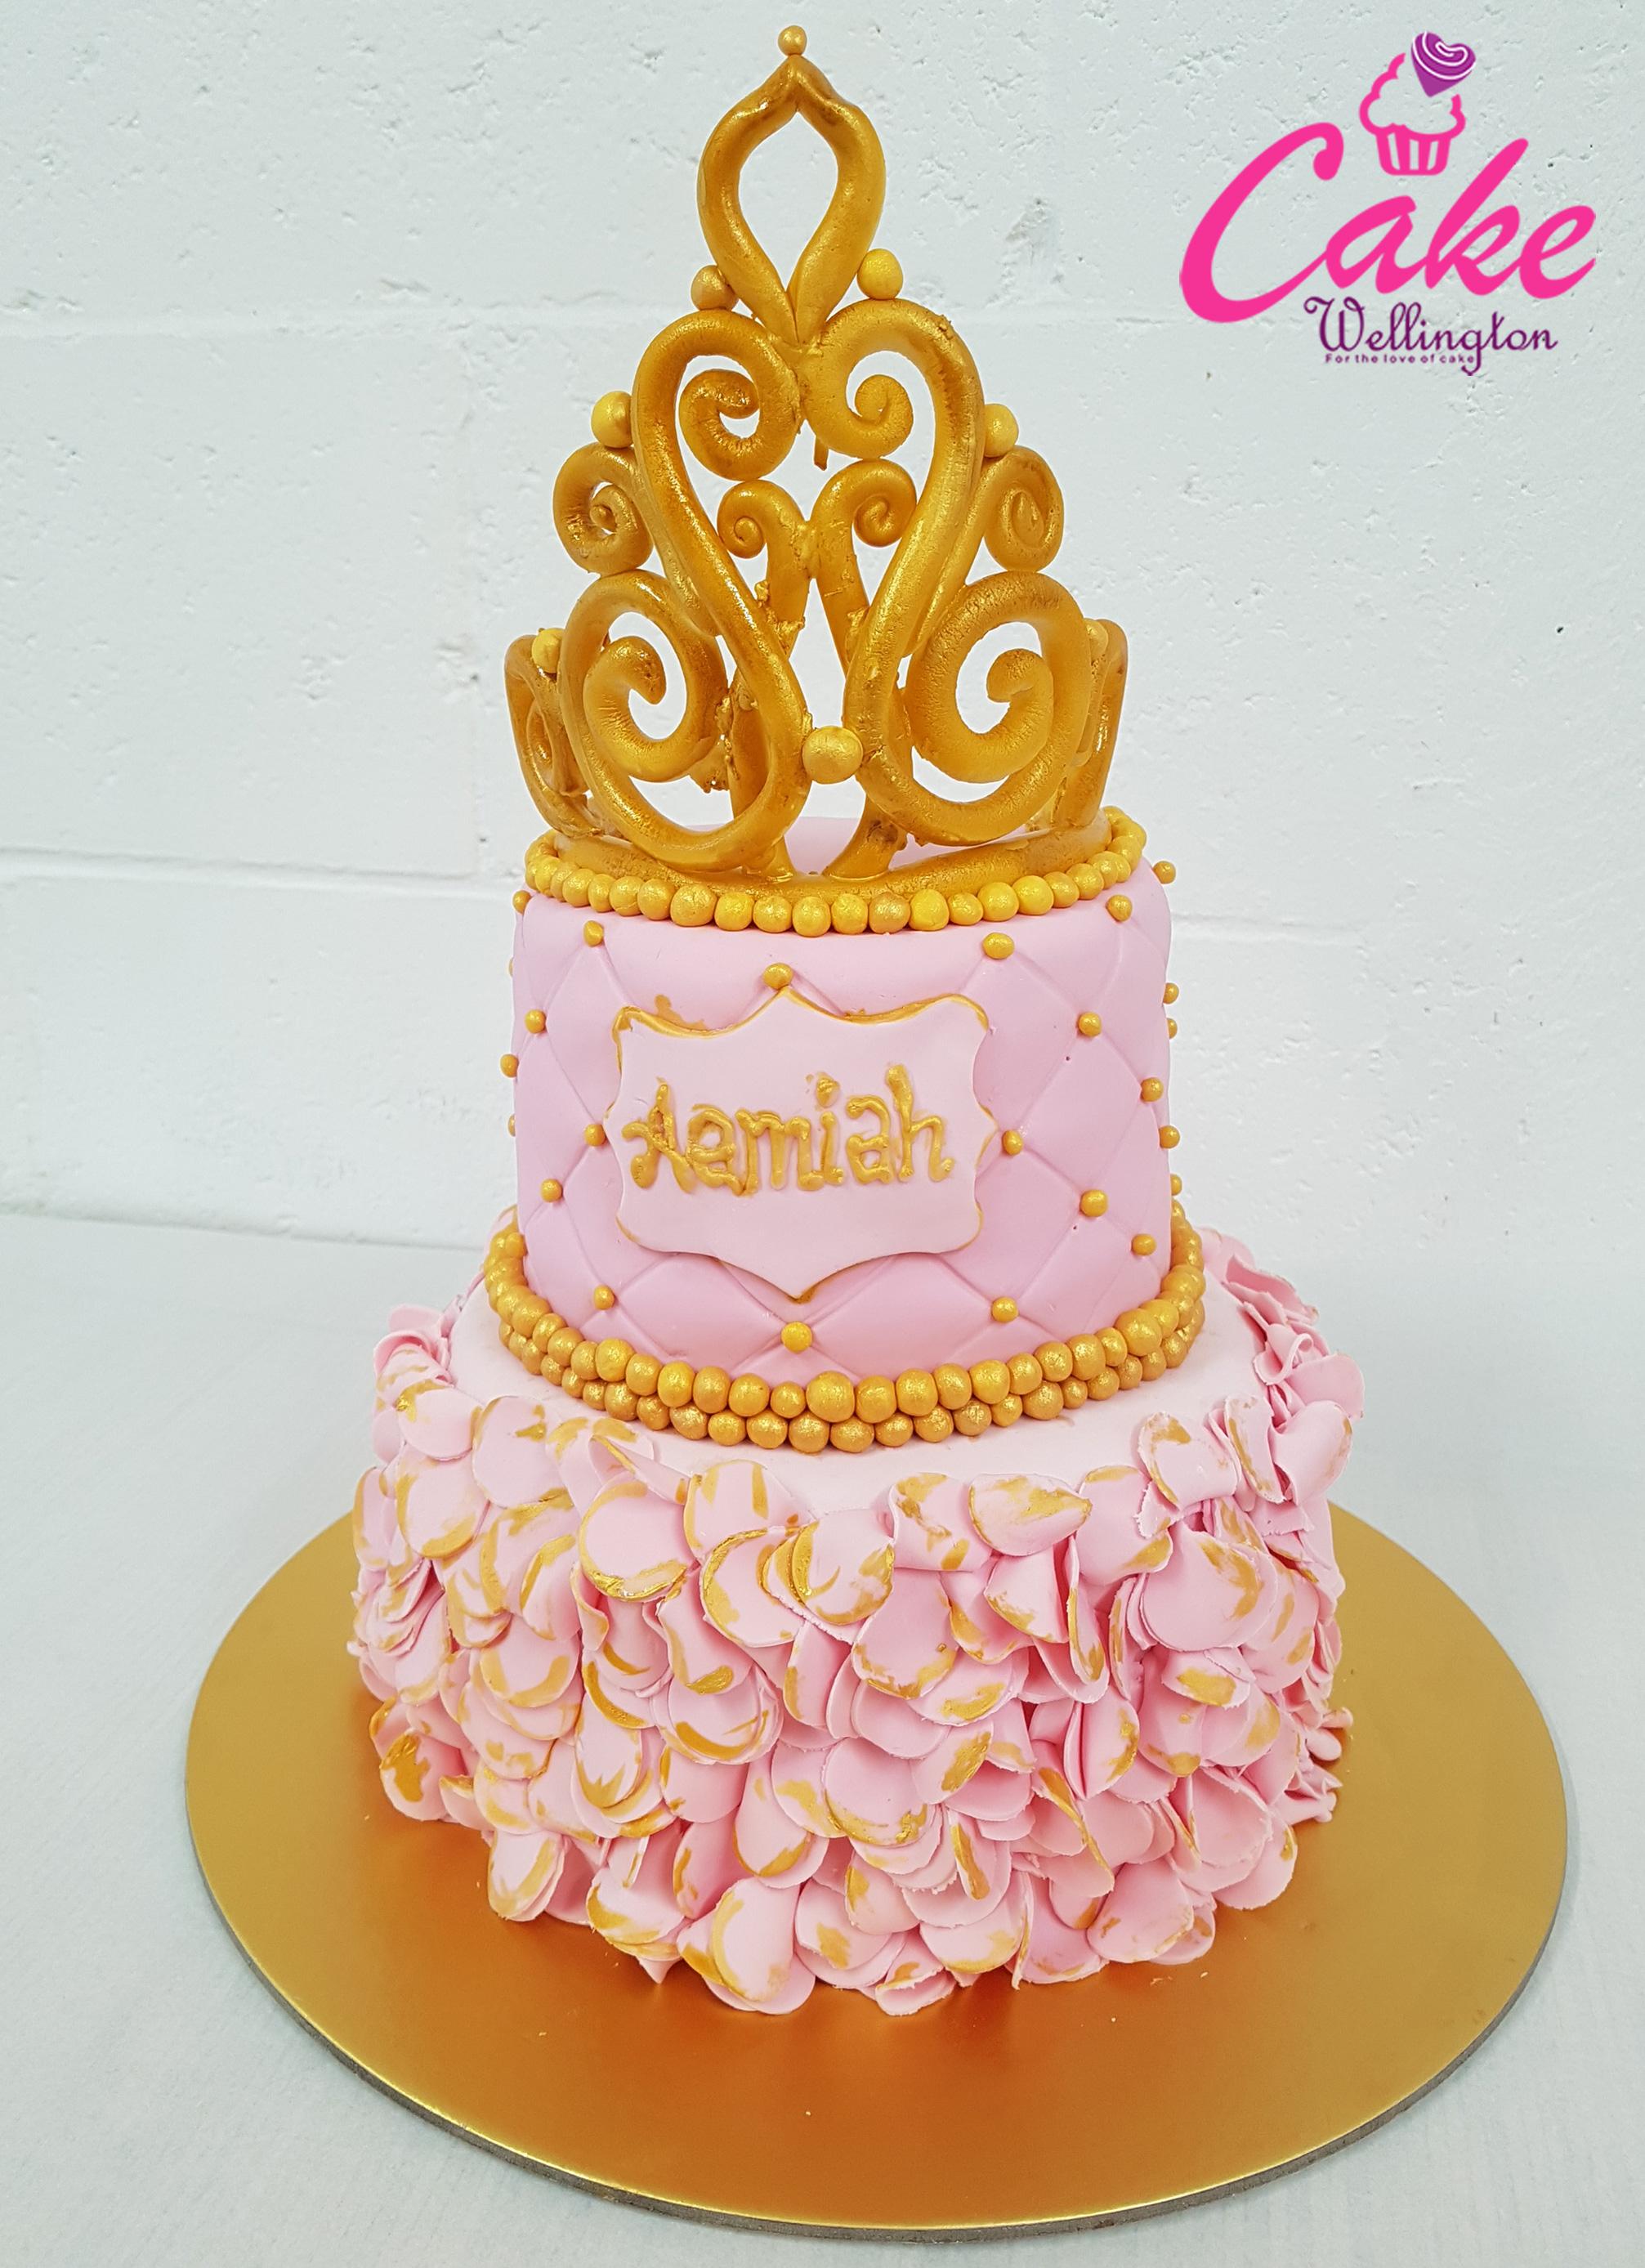 Fantastic 21St Birthday Cake 22 Cake Wellington Personalised Birthday Cards Paralily Jamesorg